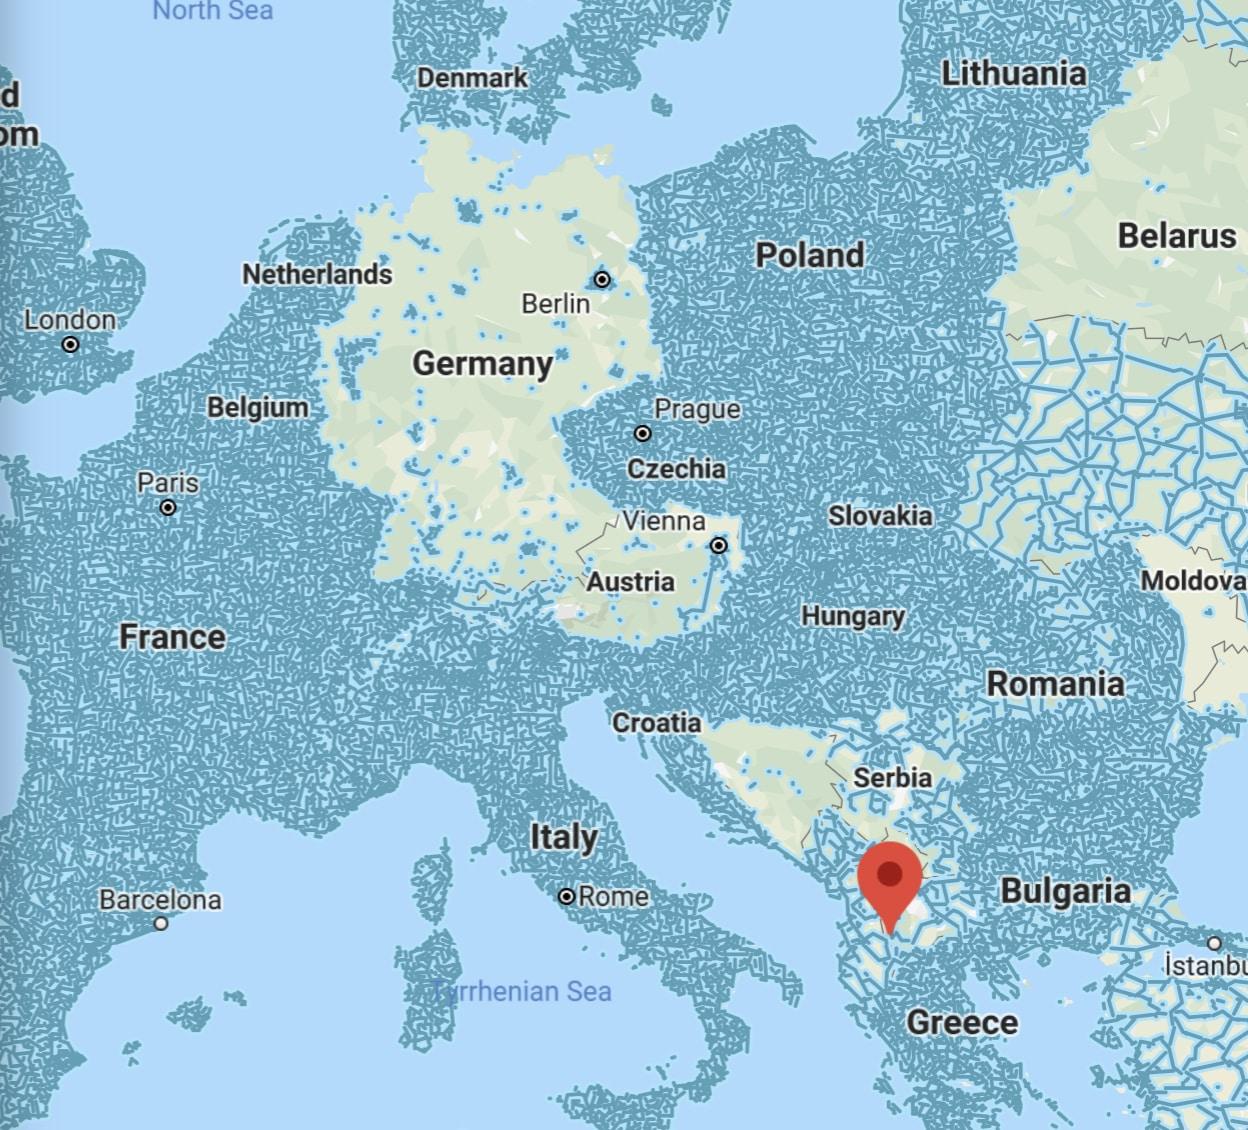 Germany Google Street View, May 2020